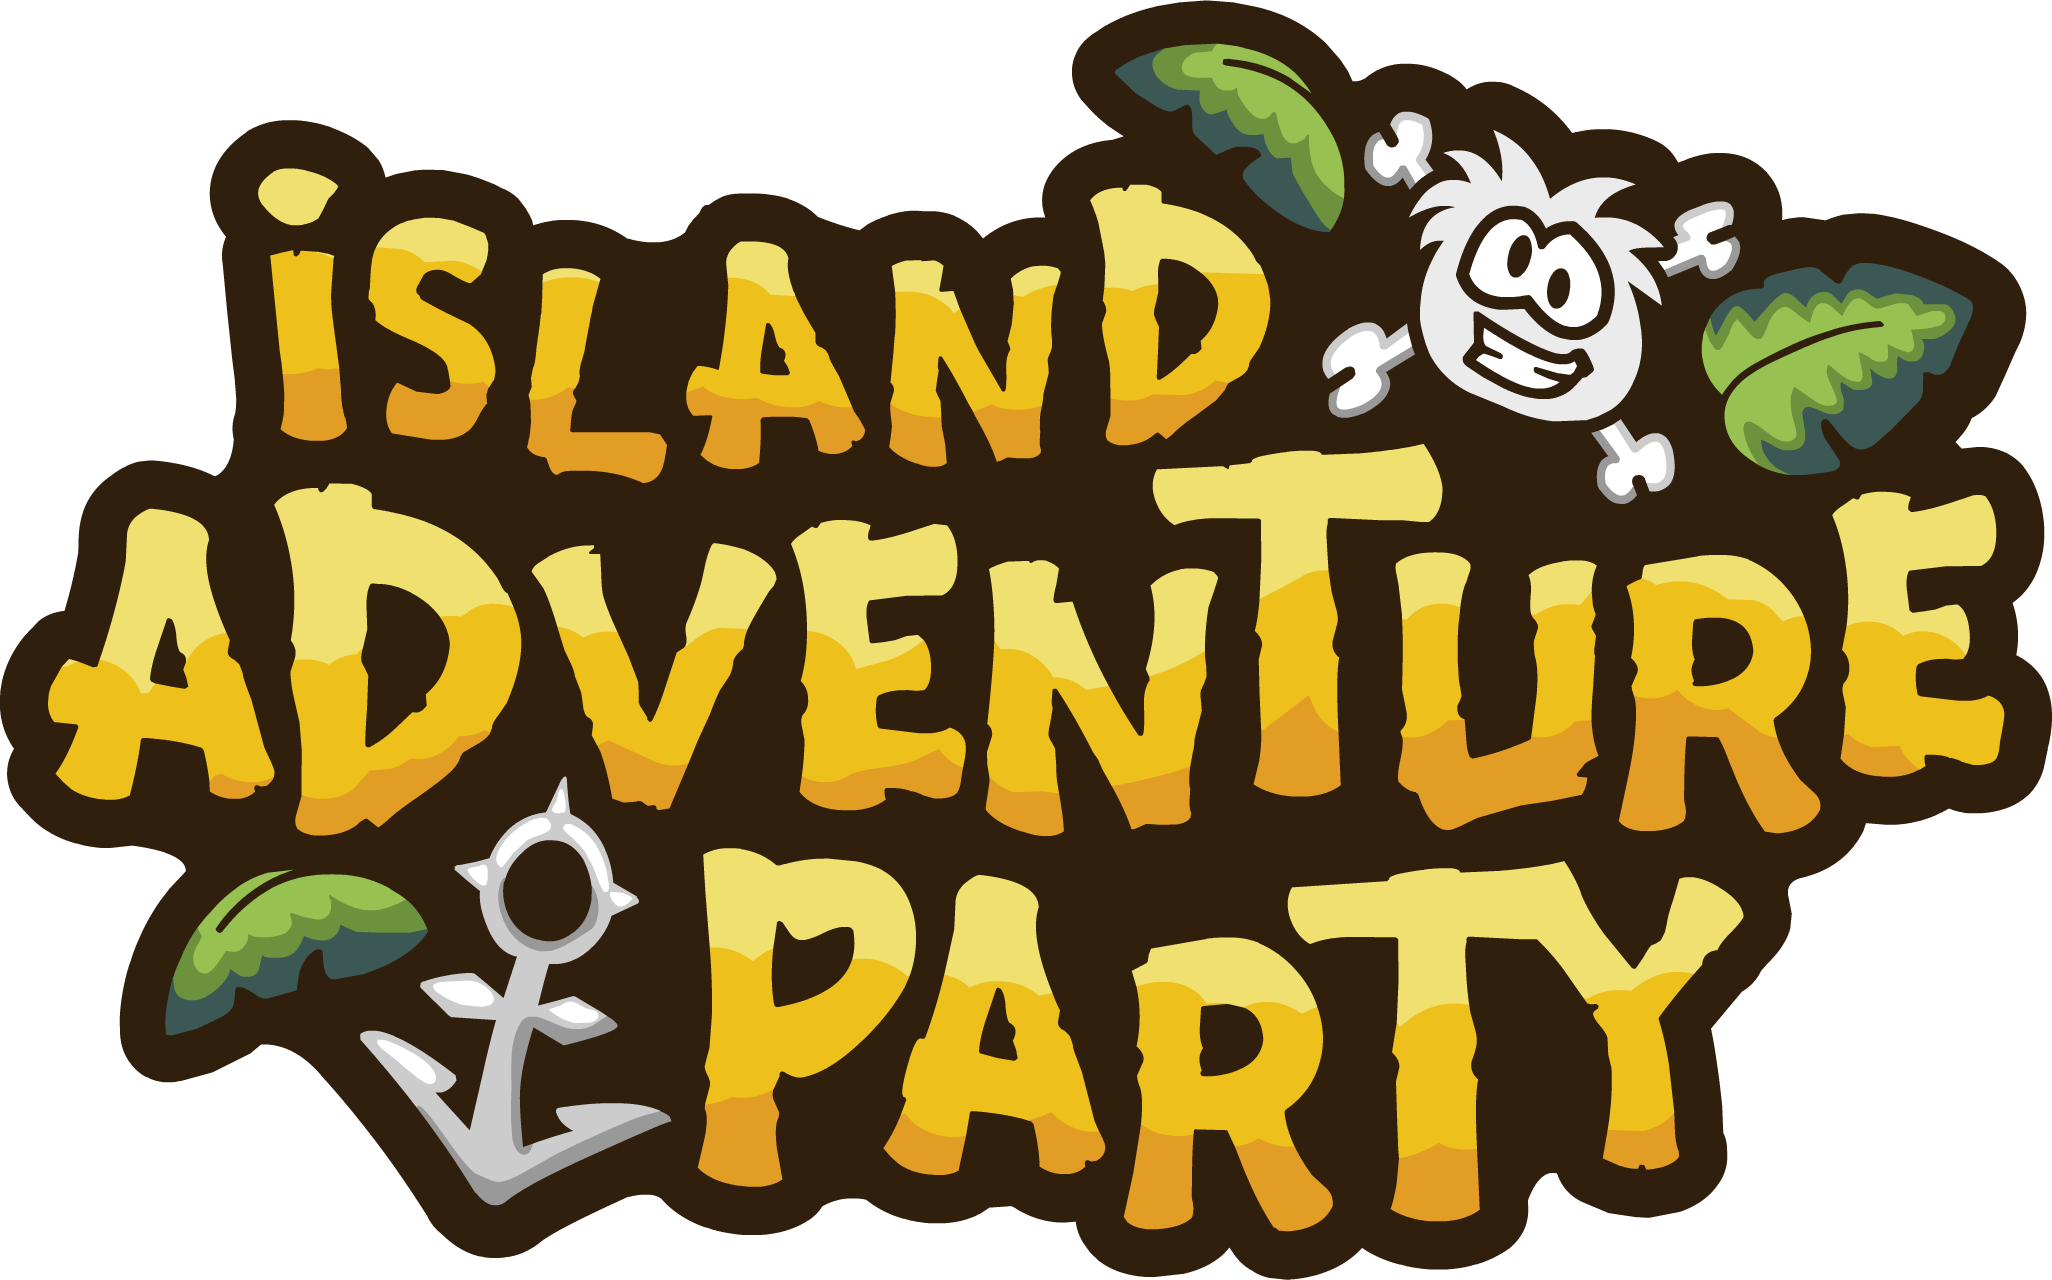 Island Adventure Party 2011.